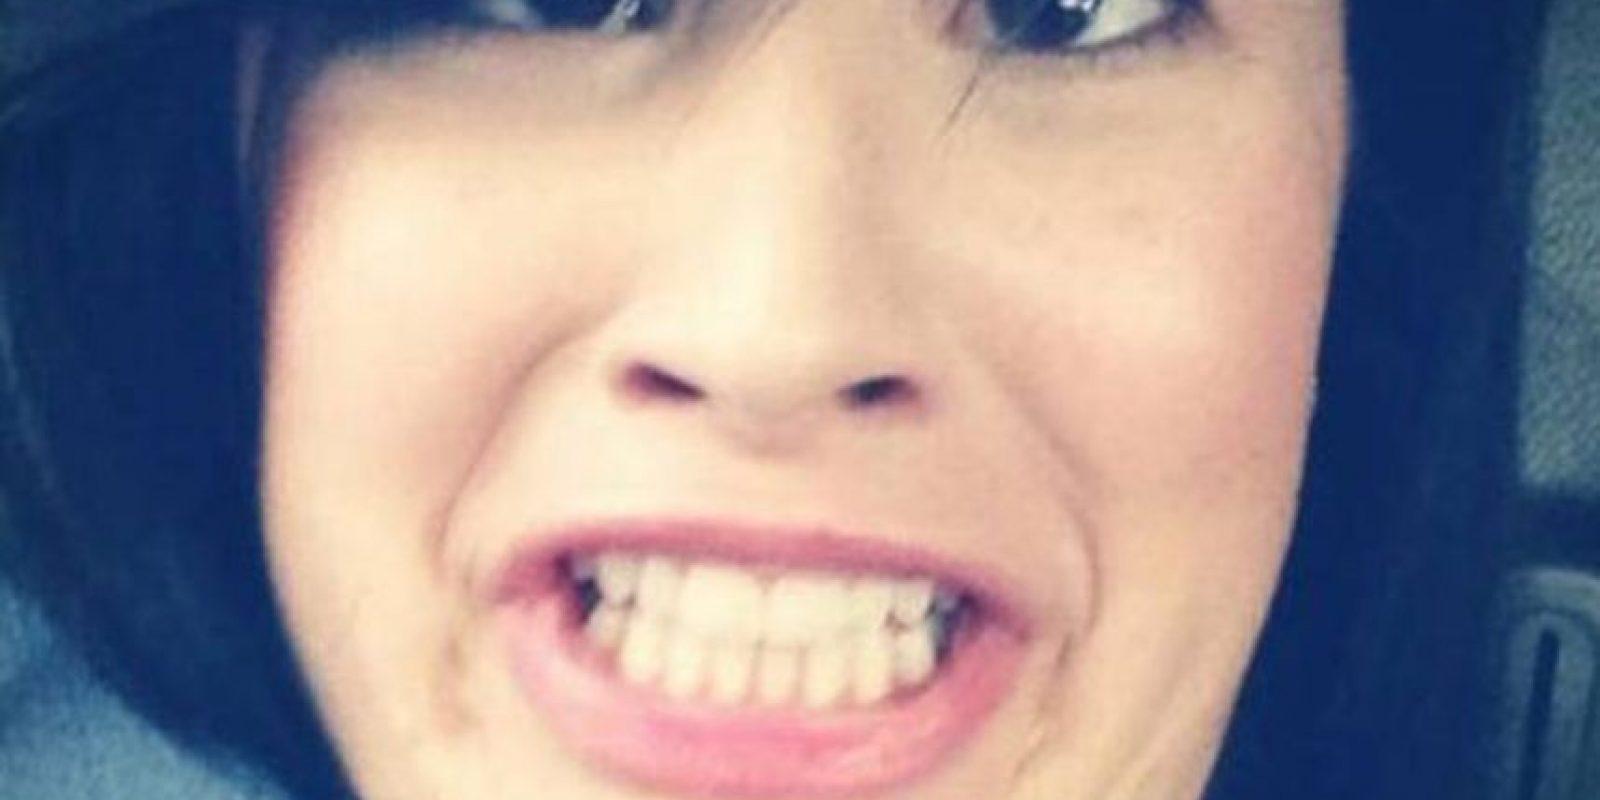 Demi Lovato, ¿estás bien? Foto:Instagram